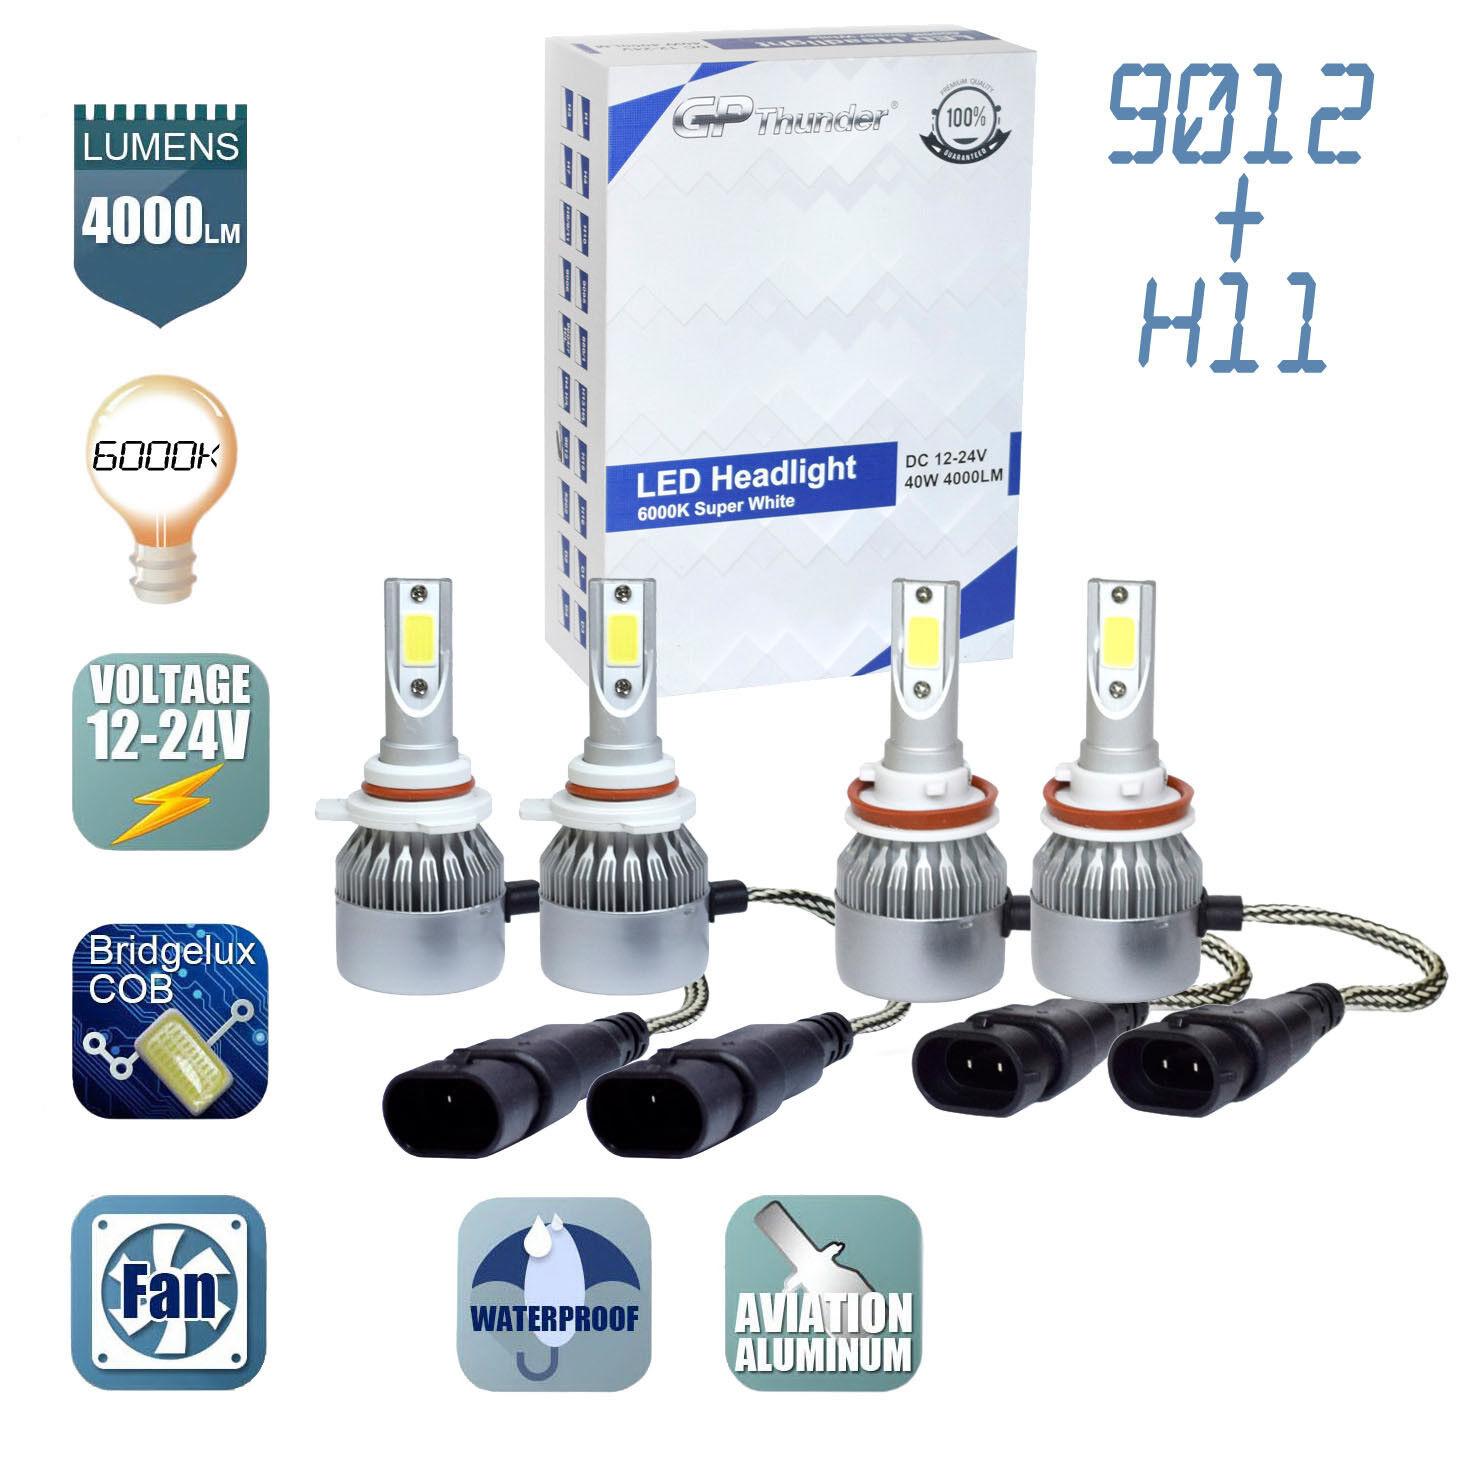 H11 Fog Light Bulbs New GP THUNDER Combo 9012 LED Headlights